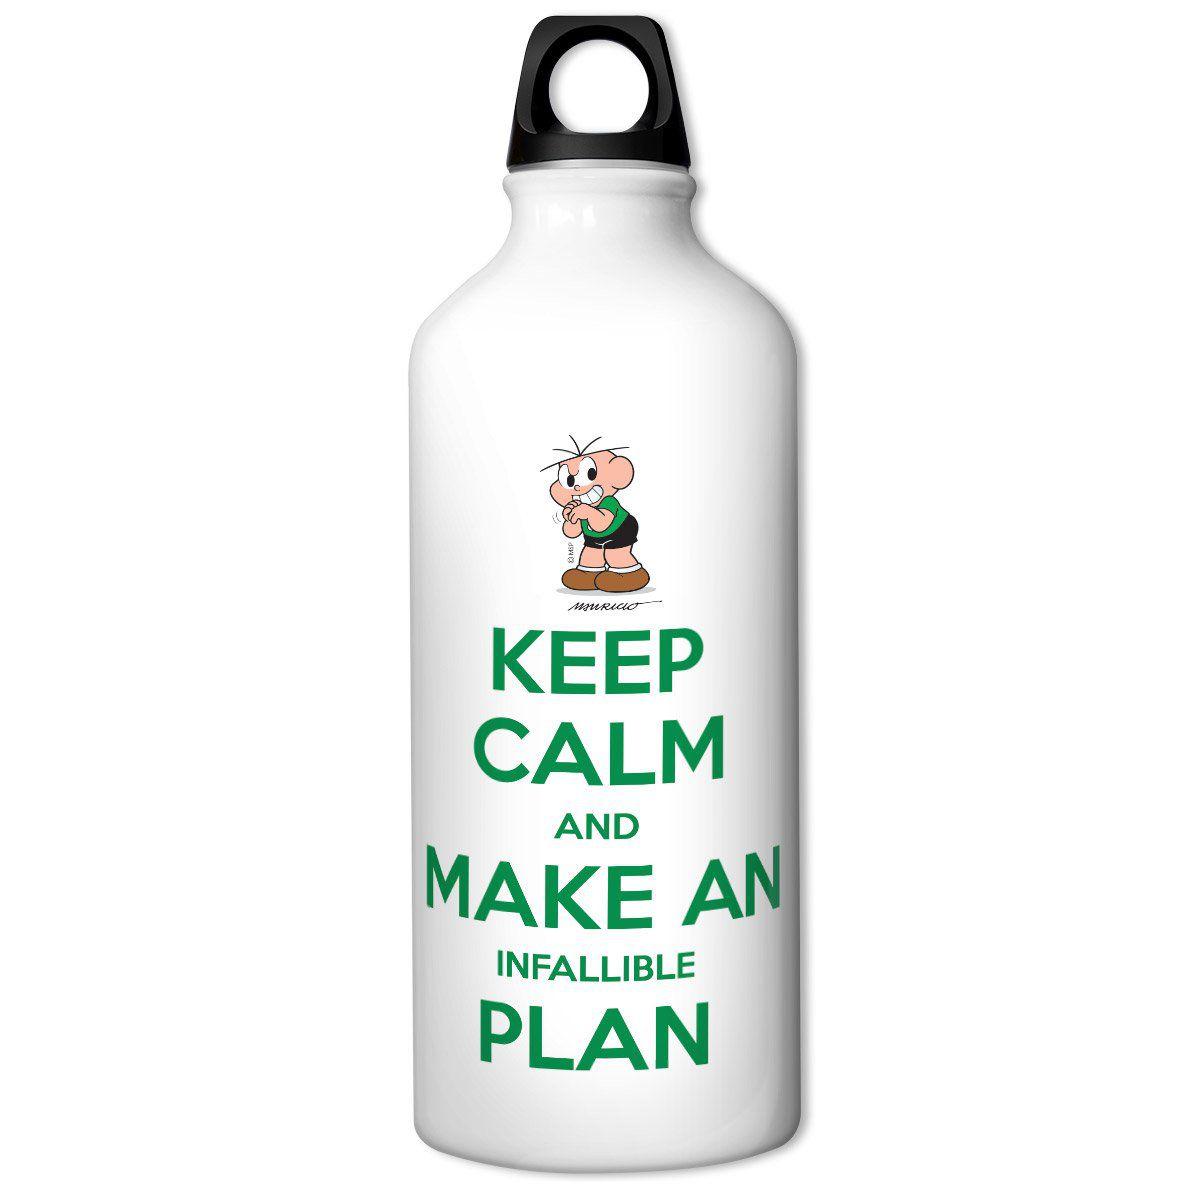 Squeeze Turma da Mônica Cool - Keep Calm And Make Infallible Plan